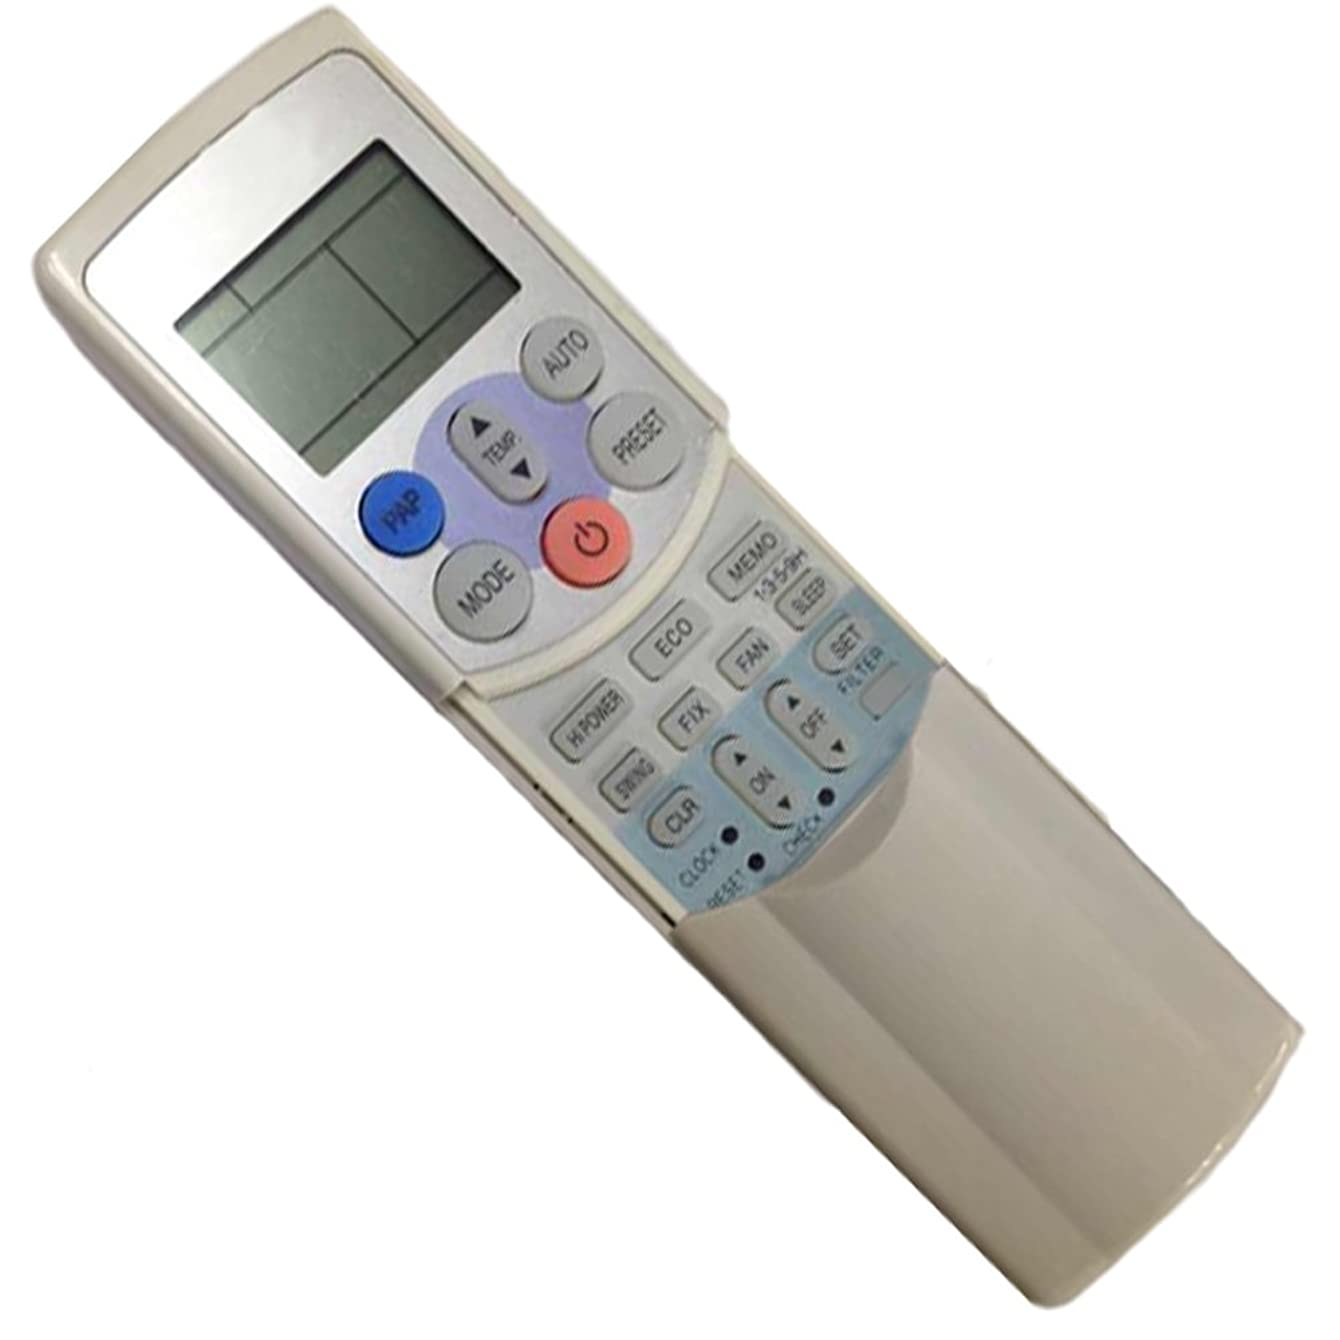 Generic Replacement Air Conditioner Remote Control for Toshiba Air Conditioner Remote Control Wc-h01je Wh-h01je Wc-h01ee Wh-h01ee Wc-h03je Wh-h03je Wc-h04je Wh-h04je Wh-h05je Wh-h06je Wh-h07je....